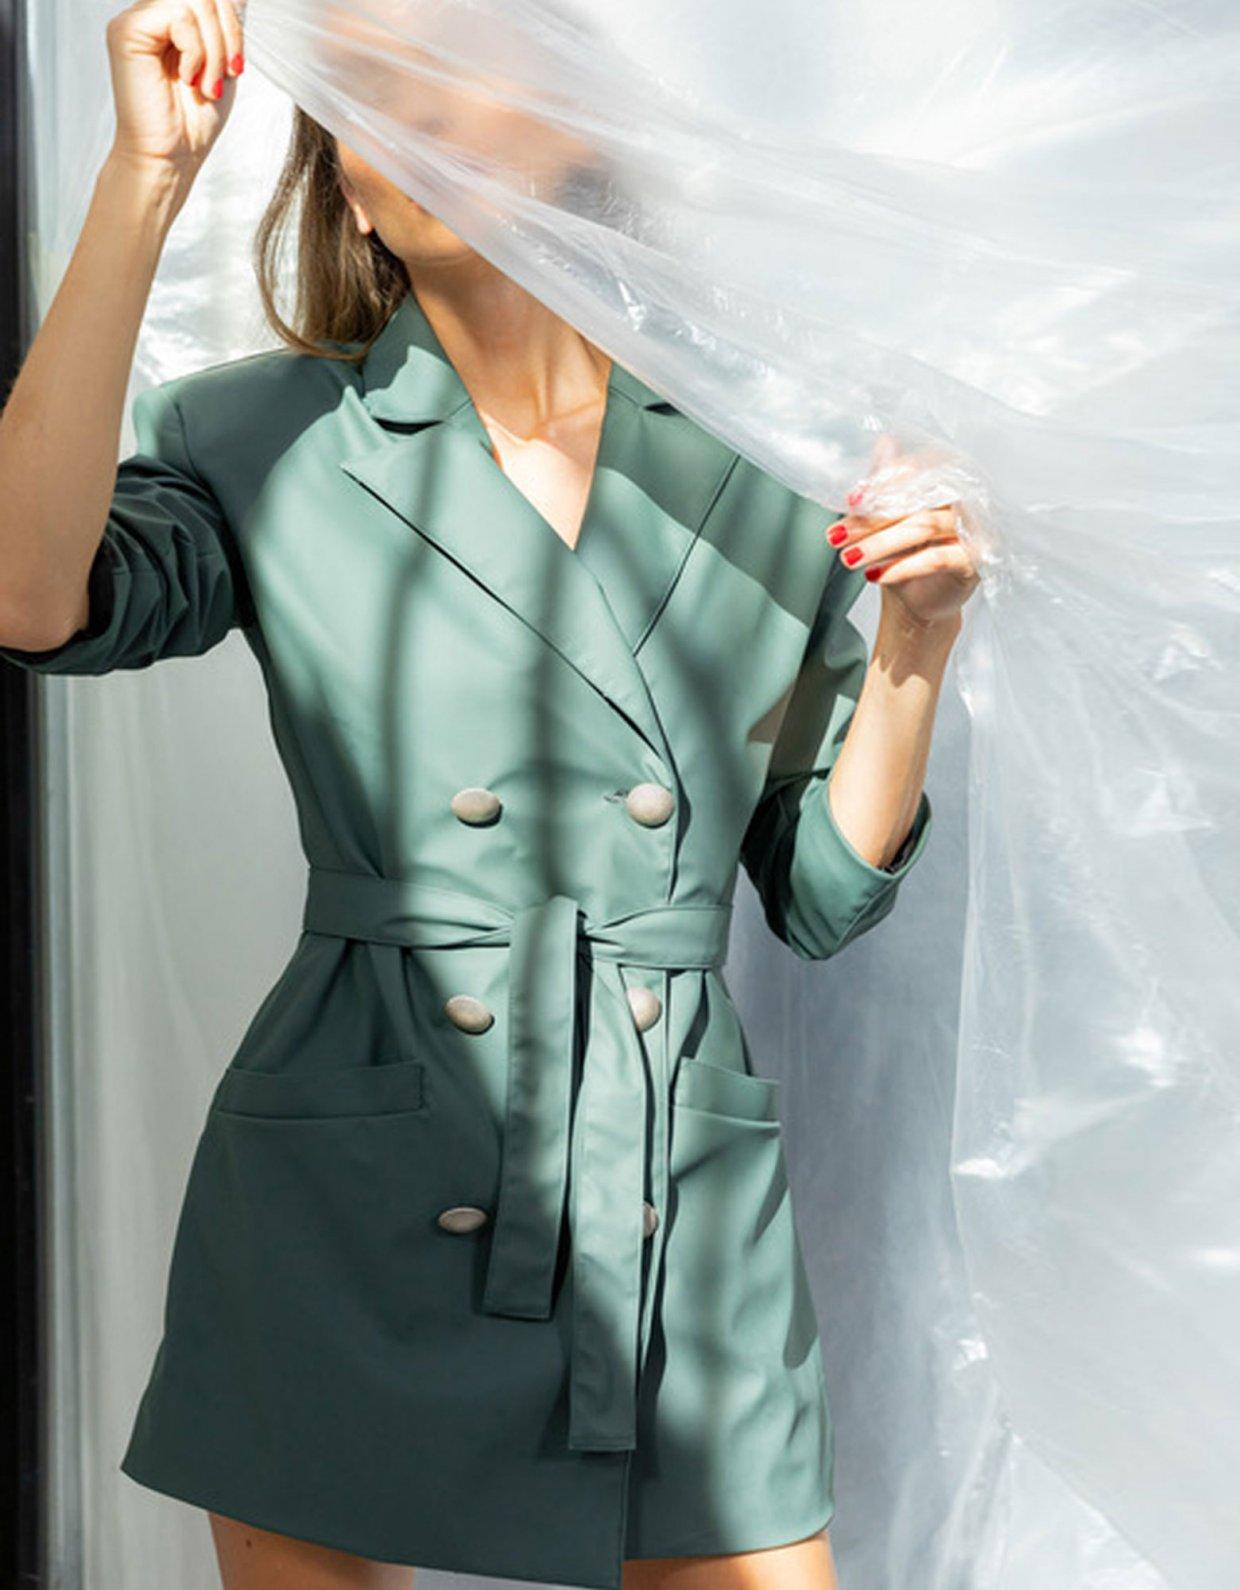 The Knl's Reassemble mat petrol blazer dress